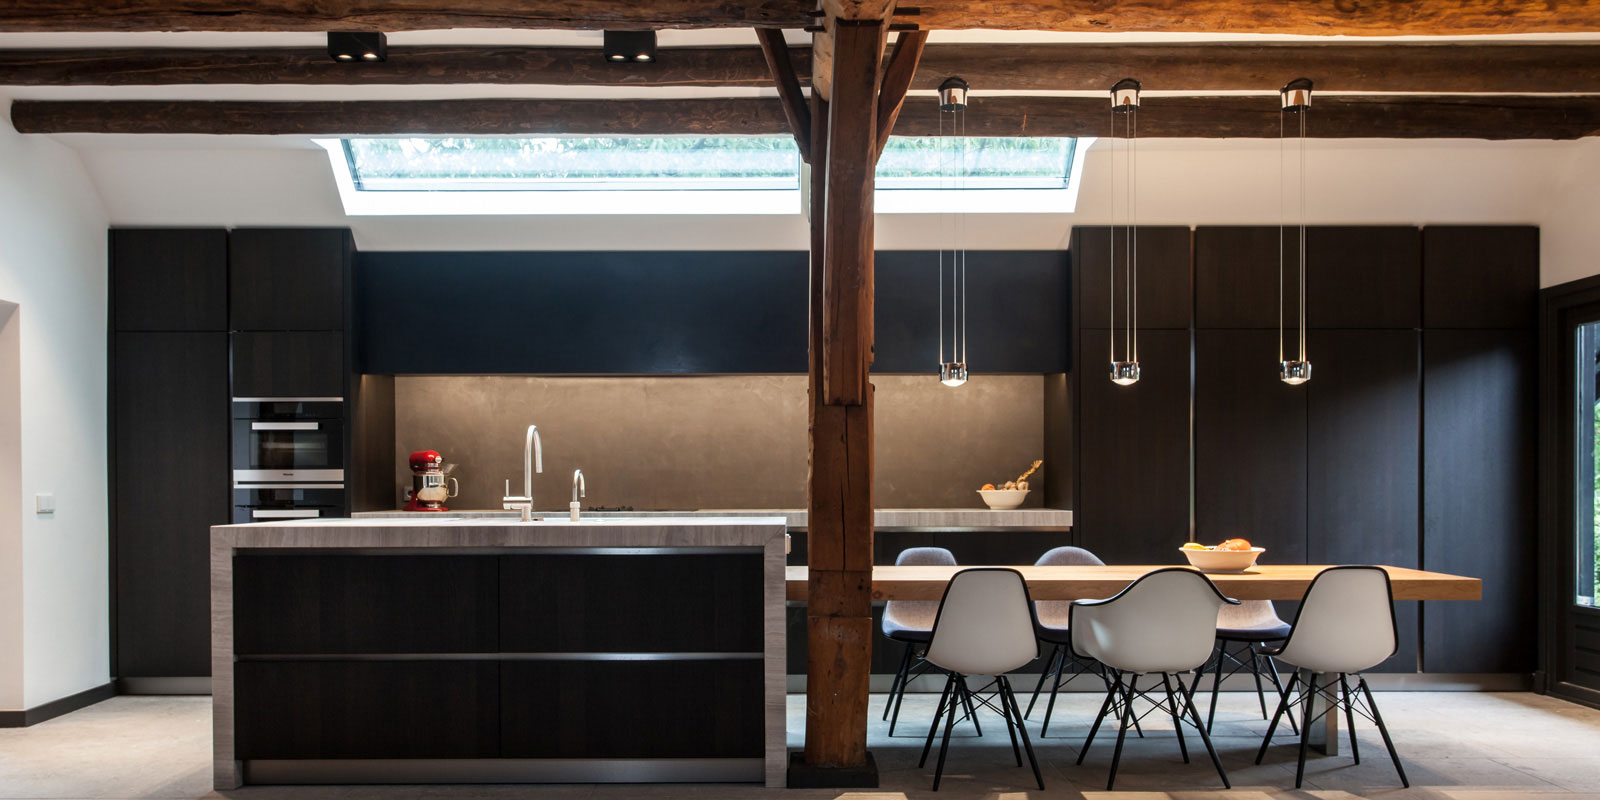 Grote keuken, Culimaat, Bob Manders, The art of living